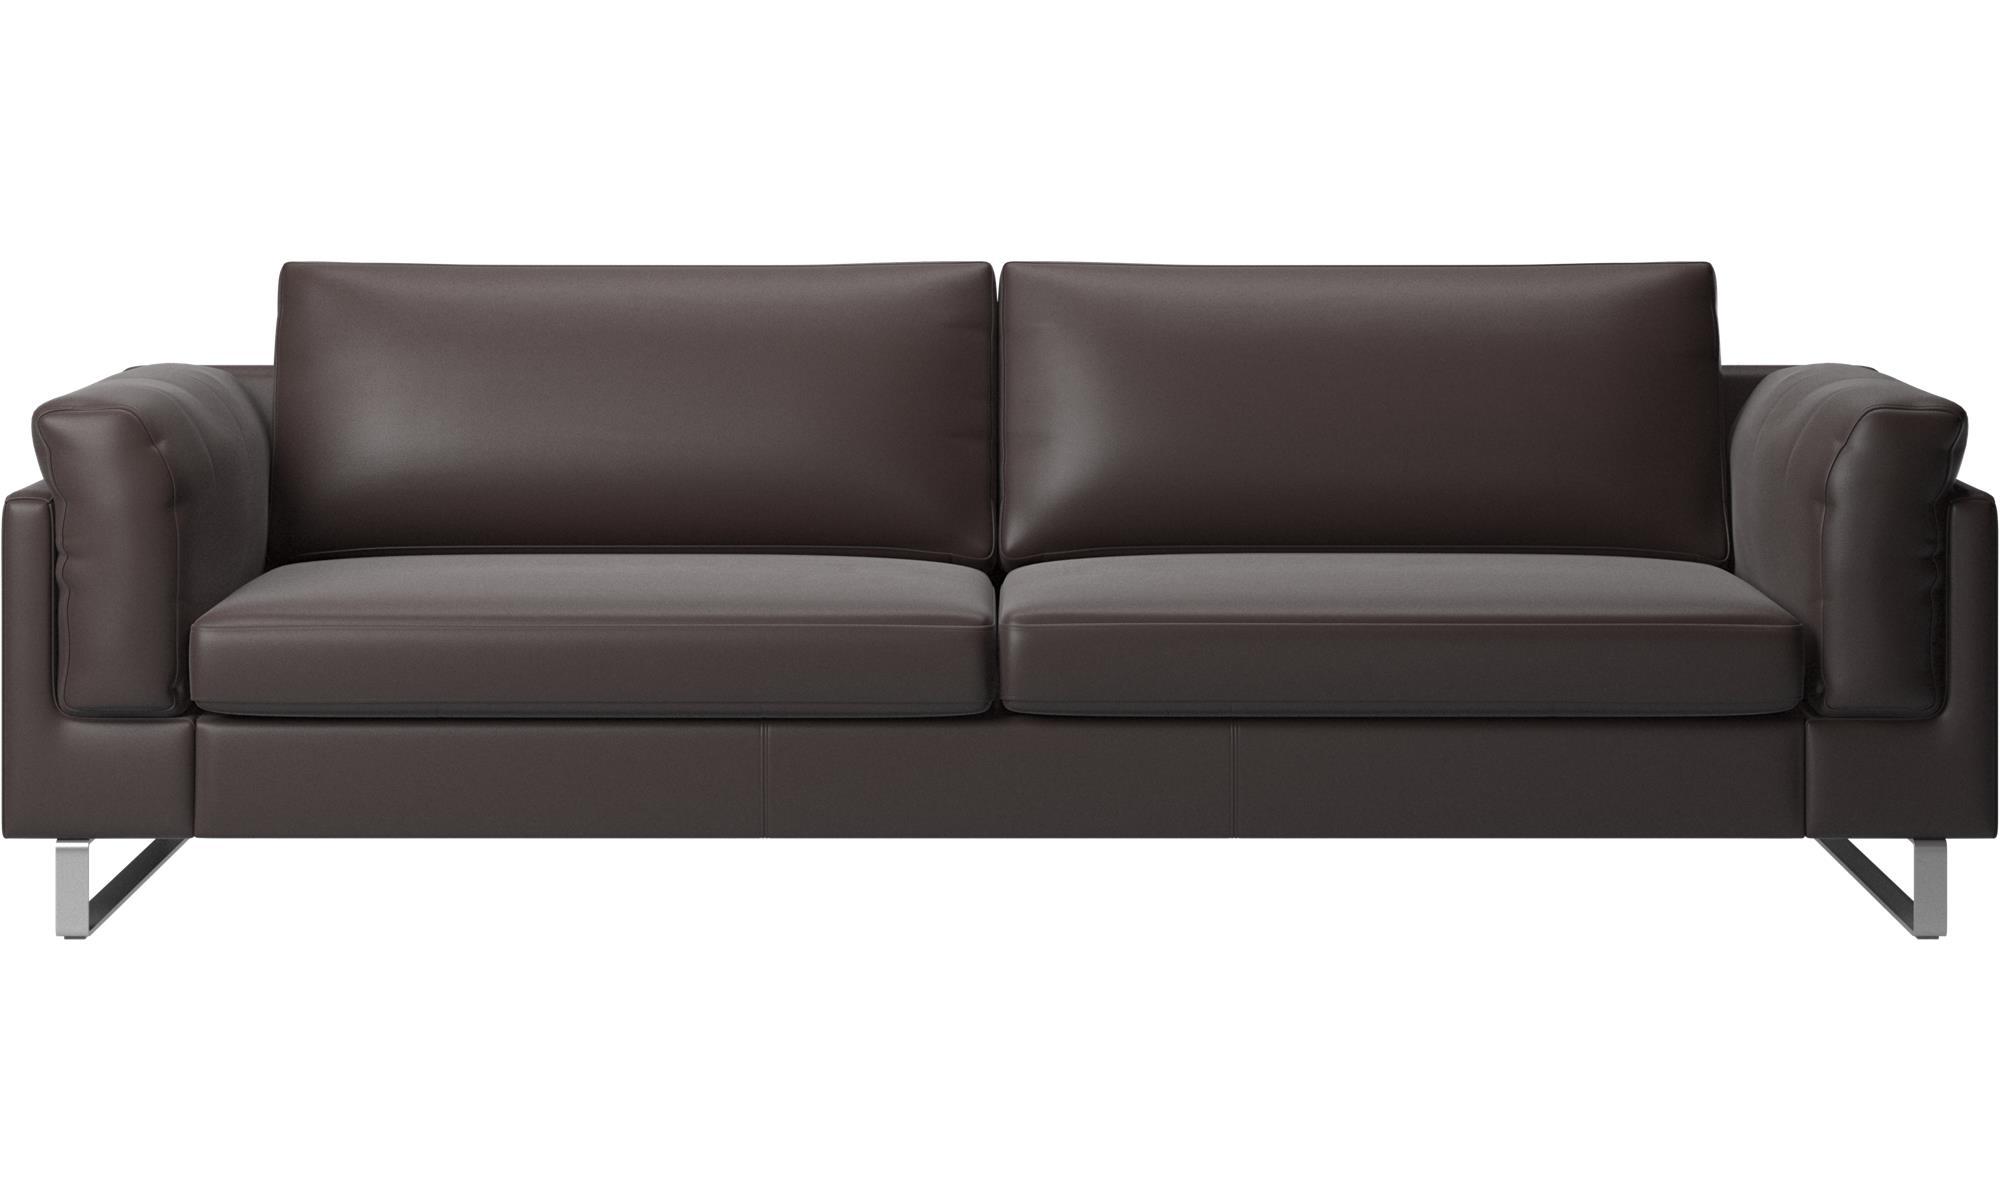 3 seater sofas indivi 2 sofa boconcept. Black Bedroom Furniture Sets. Home Design Ideas